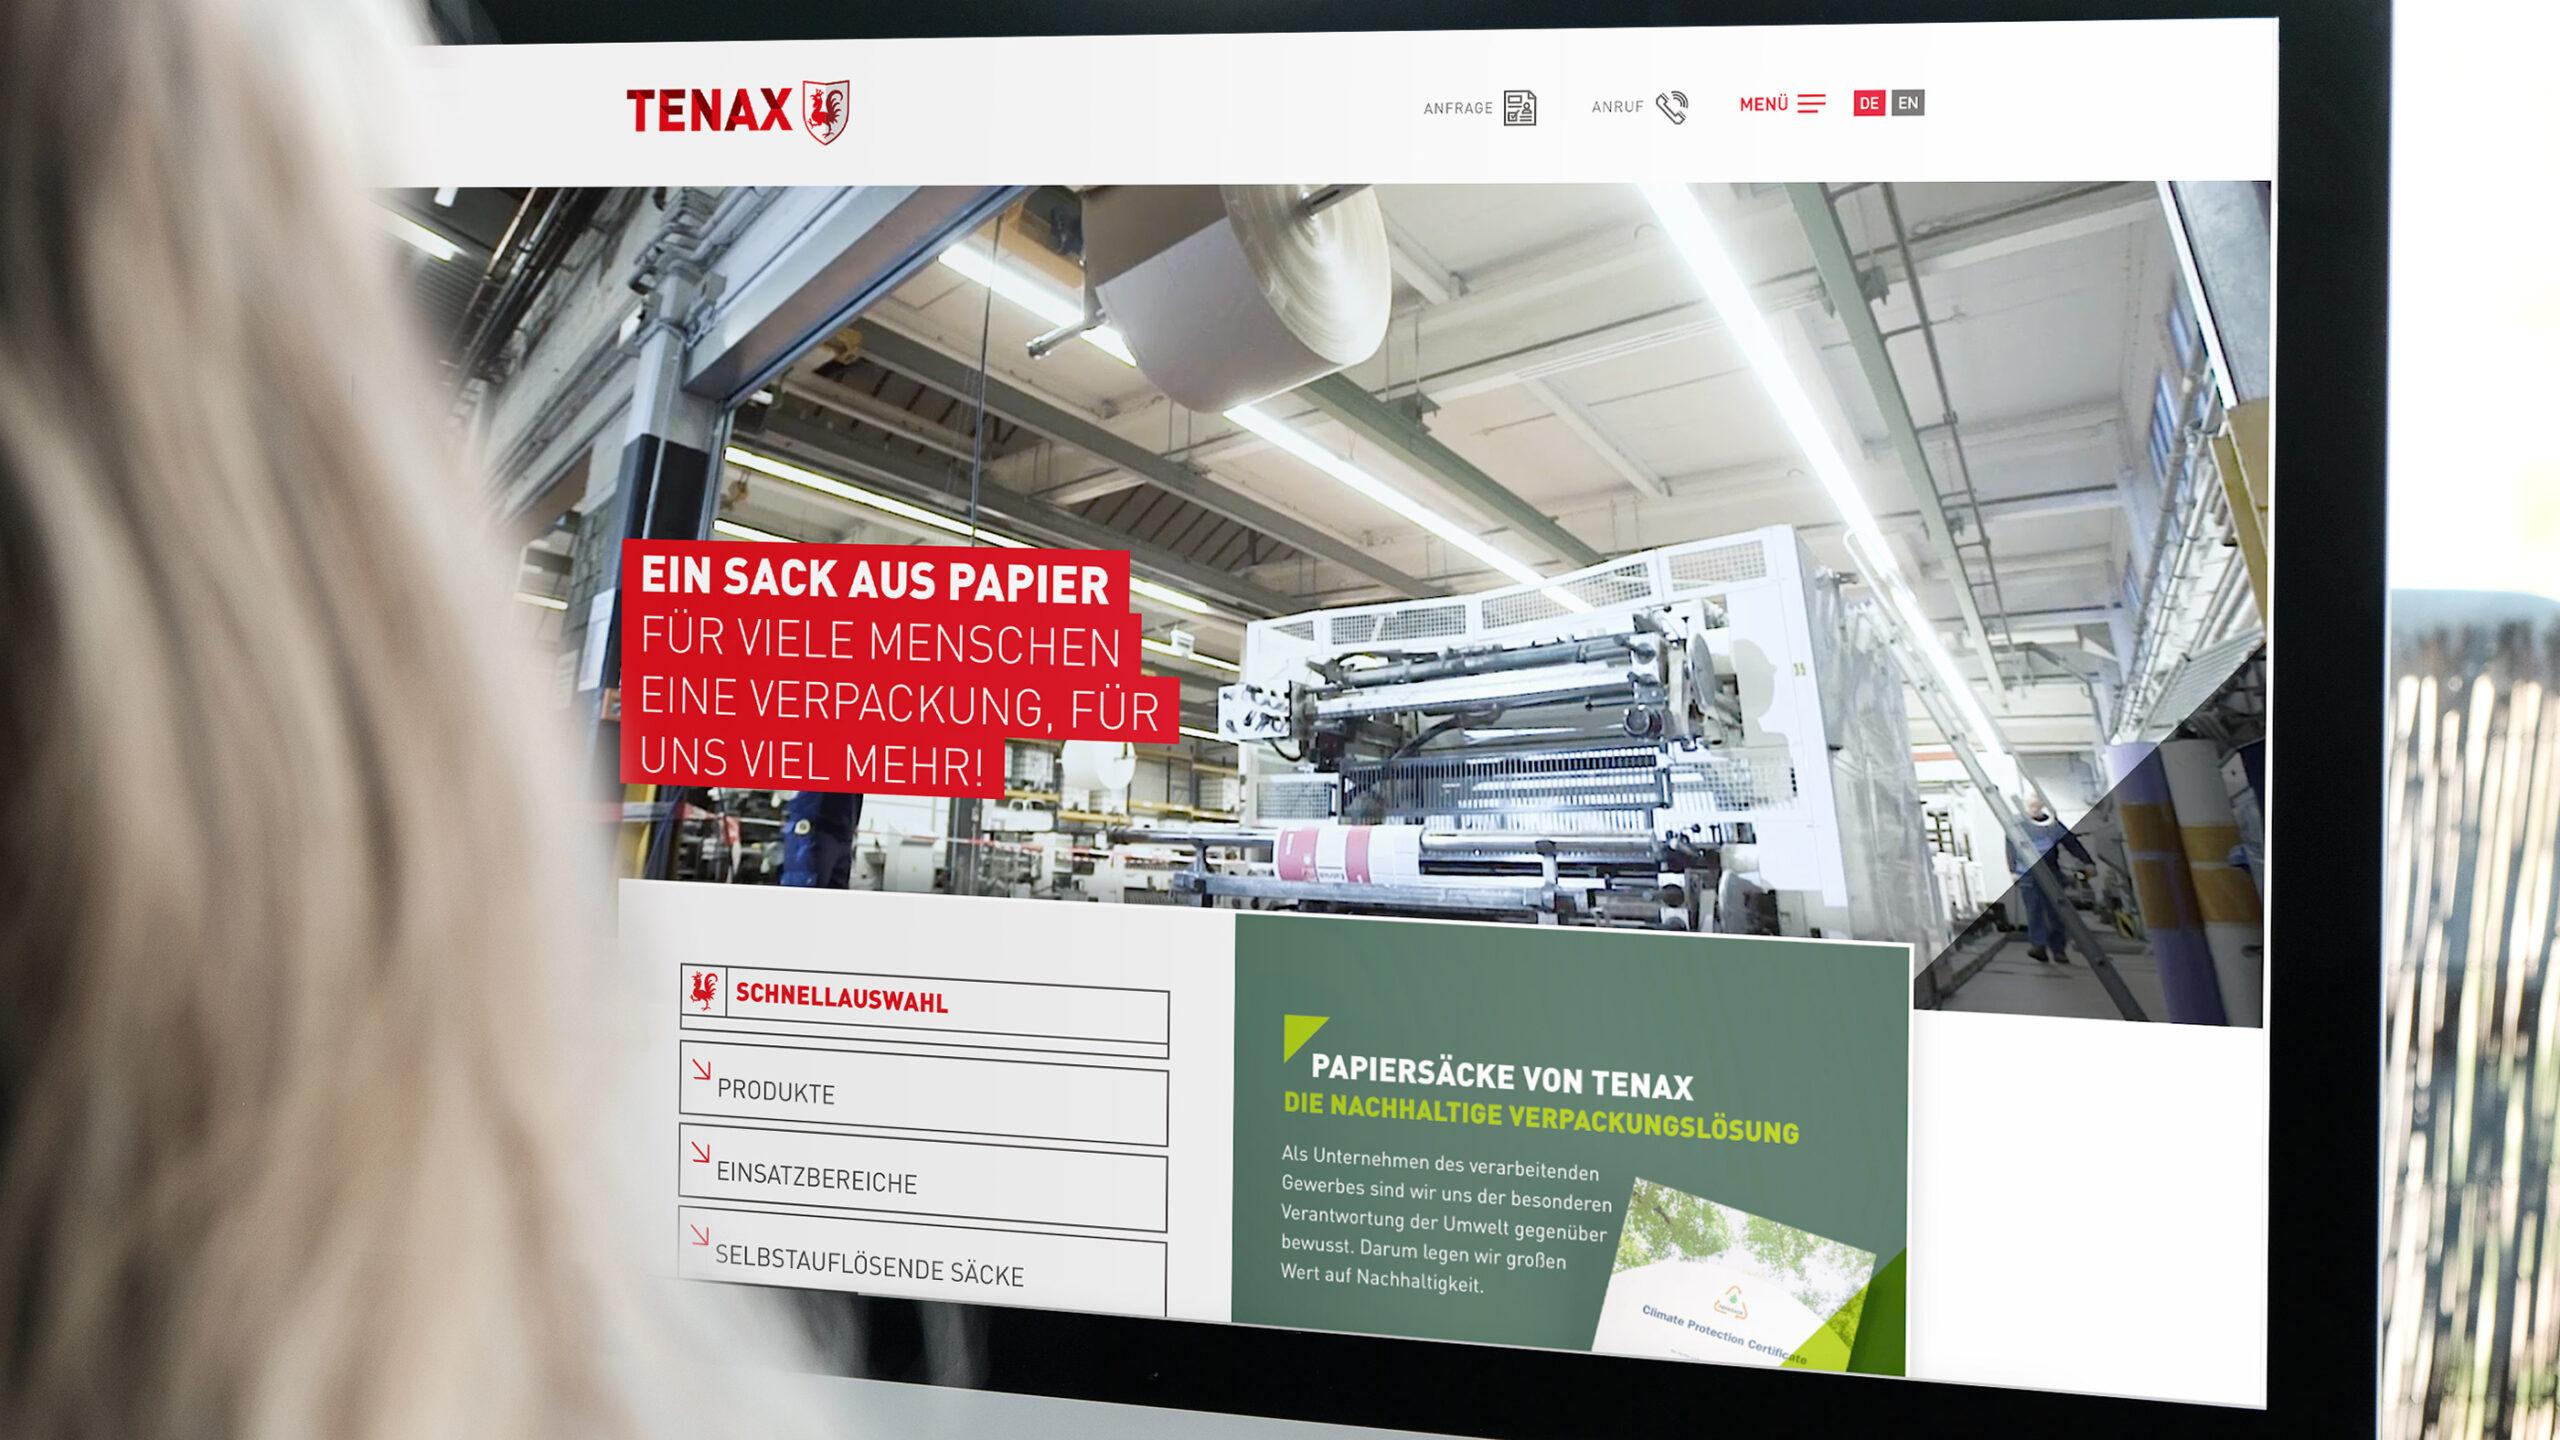 TENAX Webseite Redesign